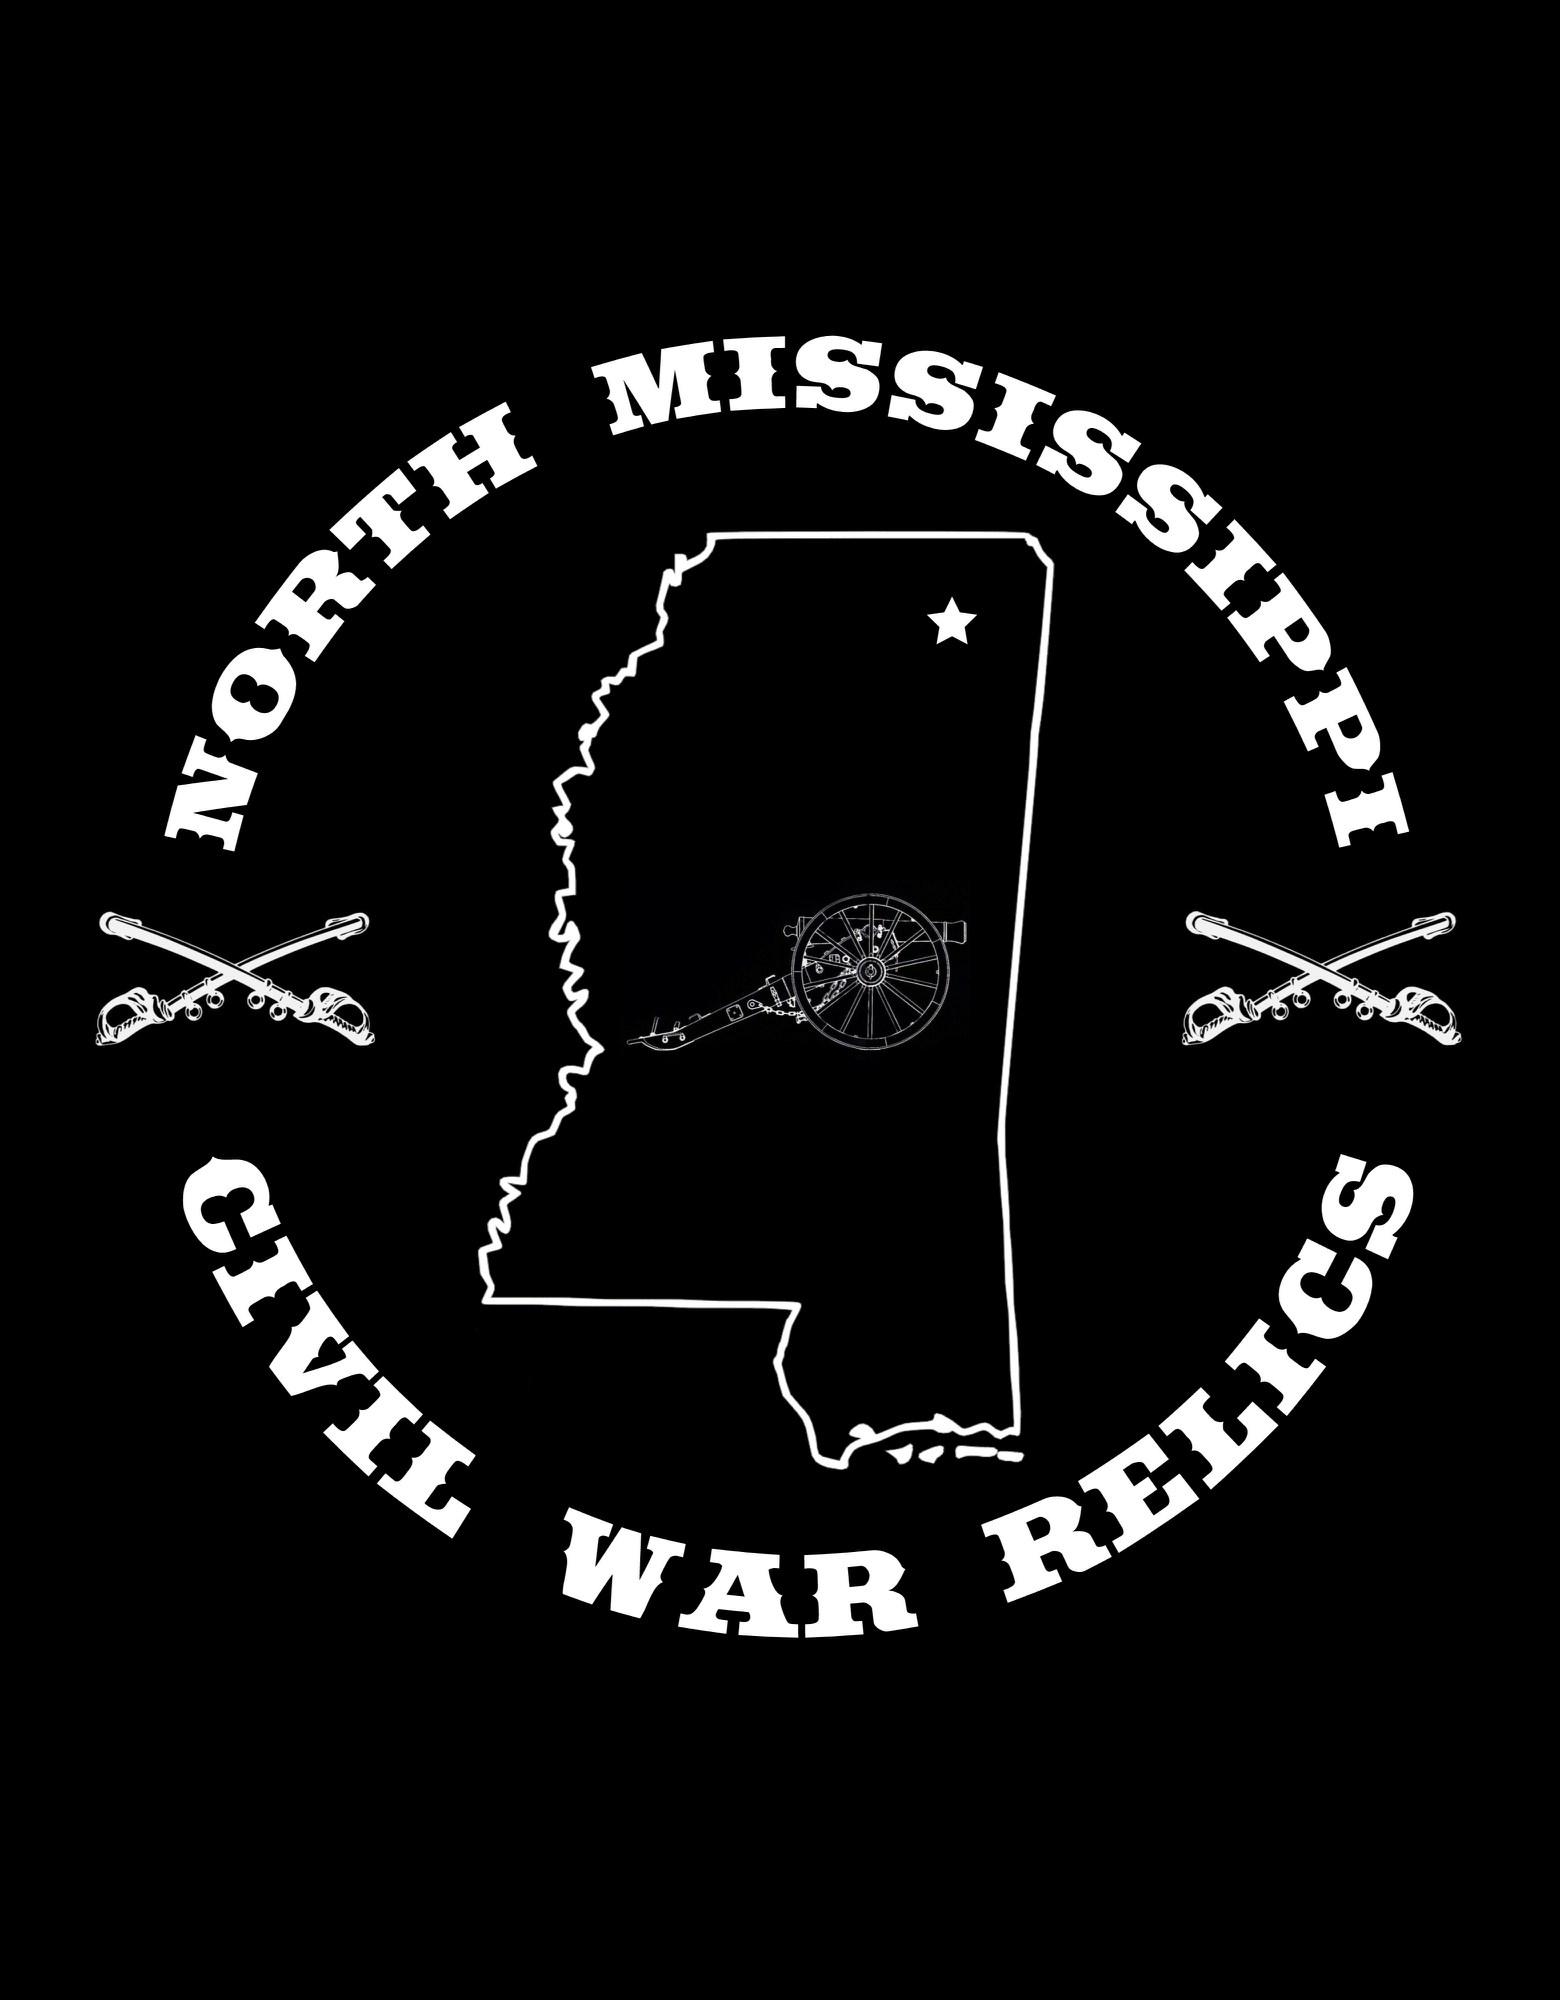 North Miss  Civil War Relics: Misc  Excavated